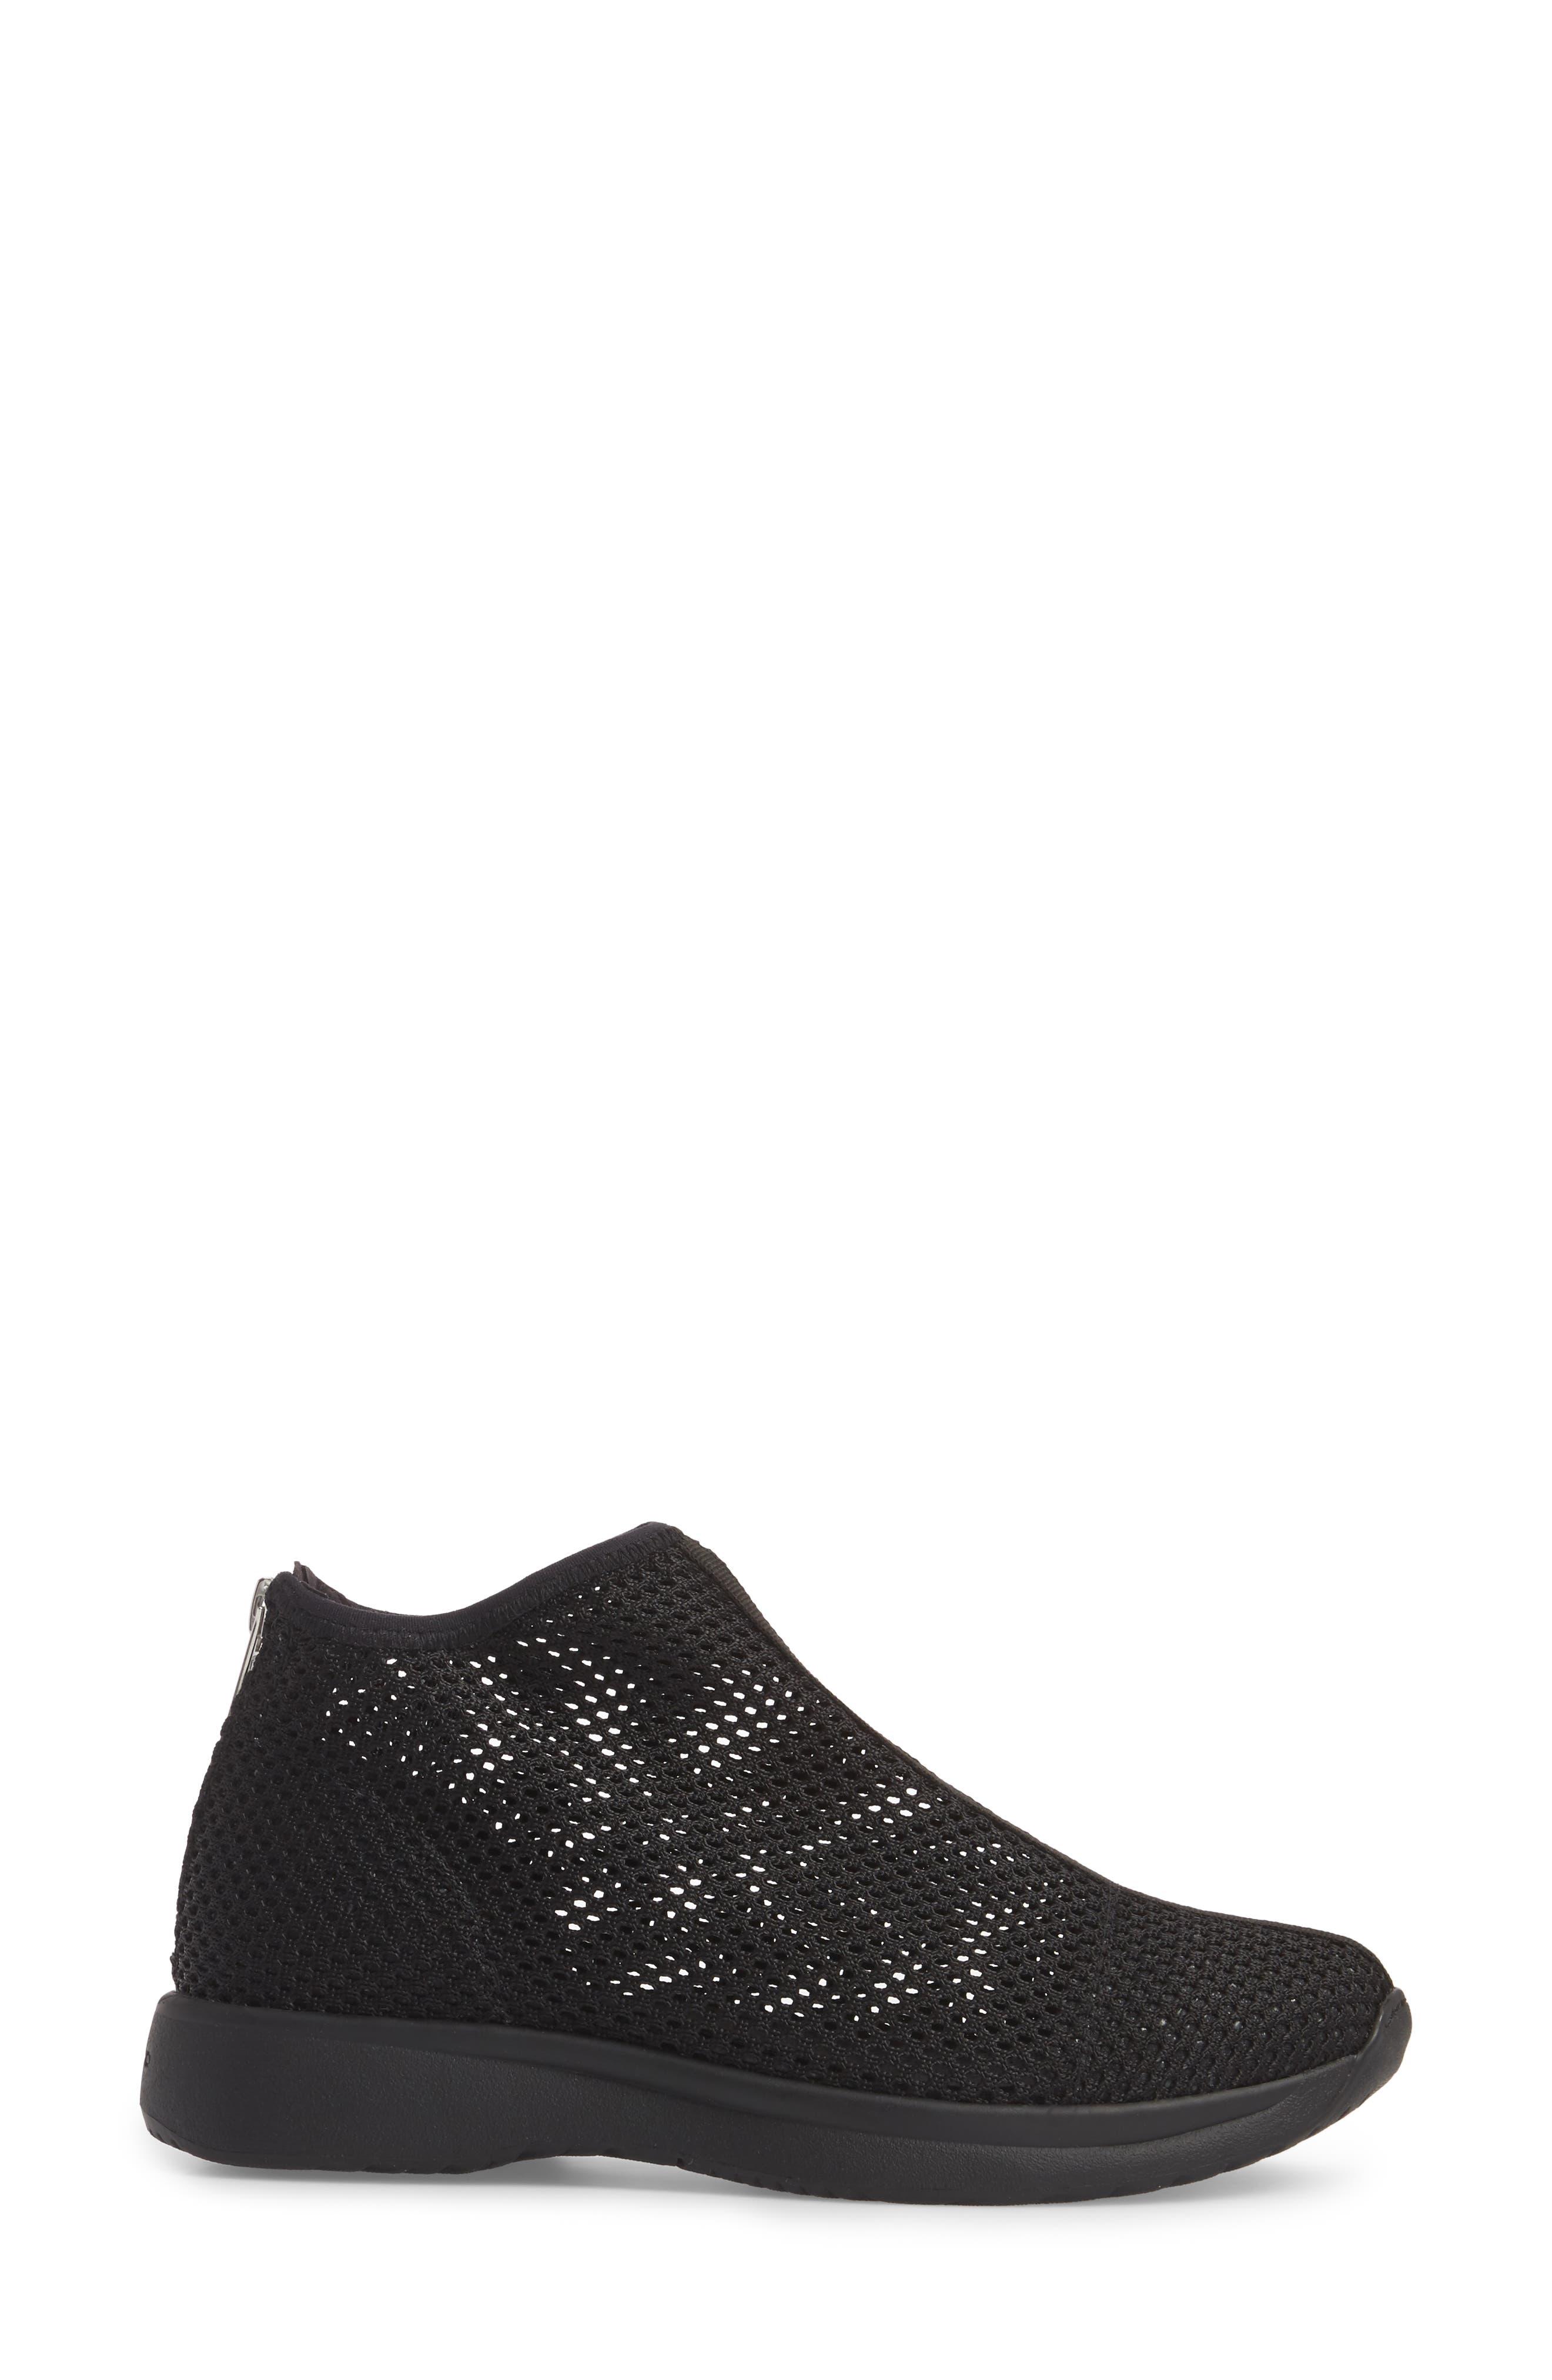 Cintia Sneaker,                             Alternate thumbnail 3, color,                             BLACK FABRIC